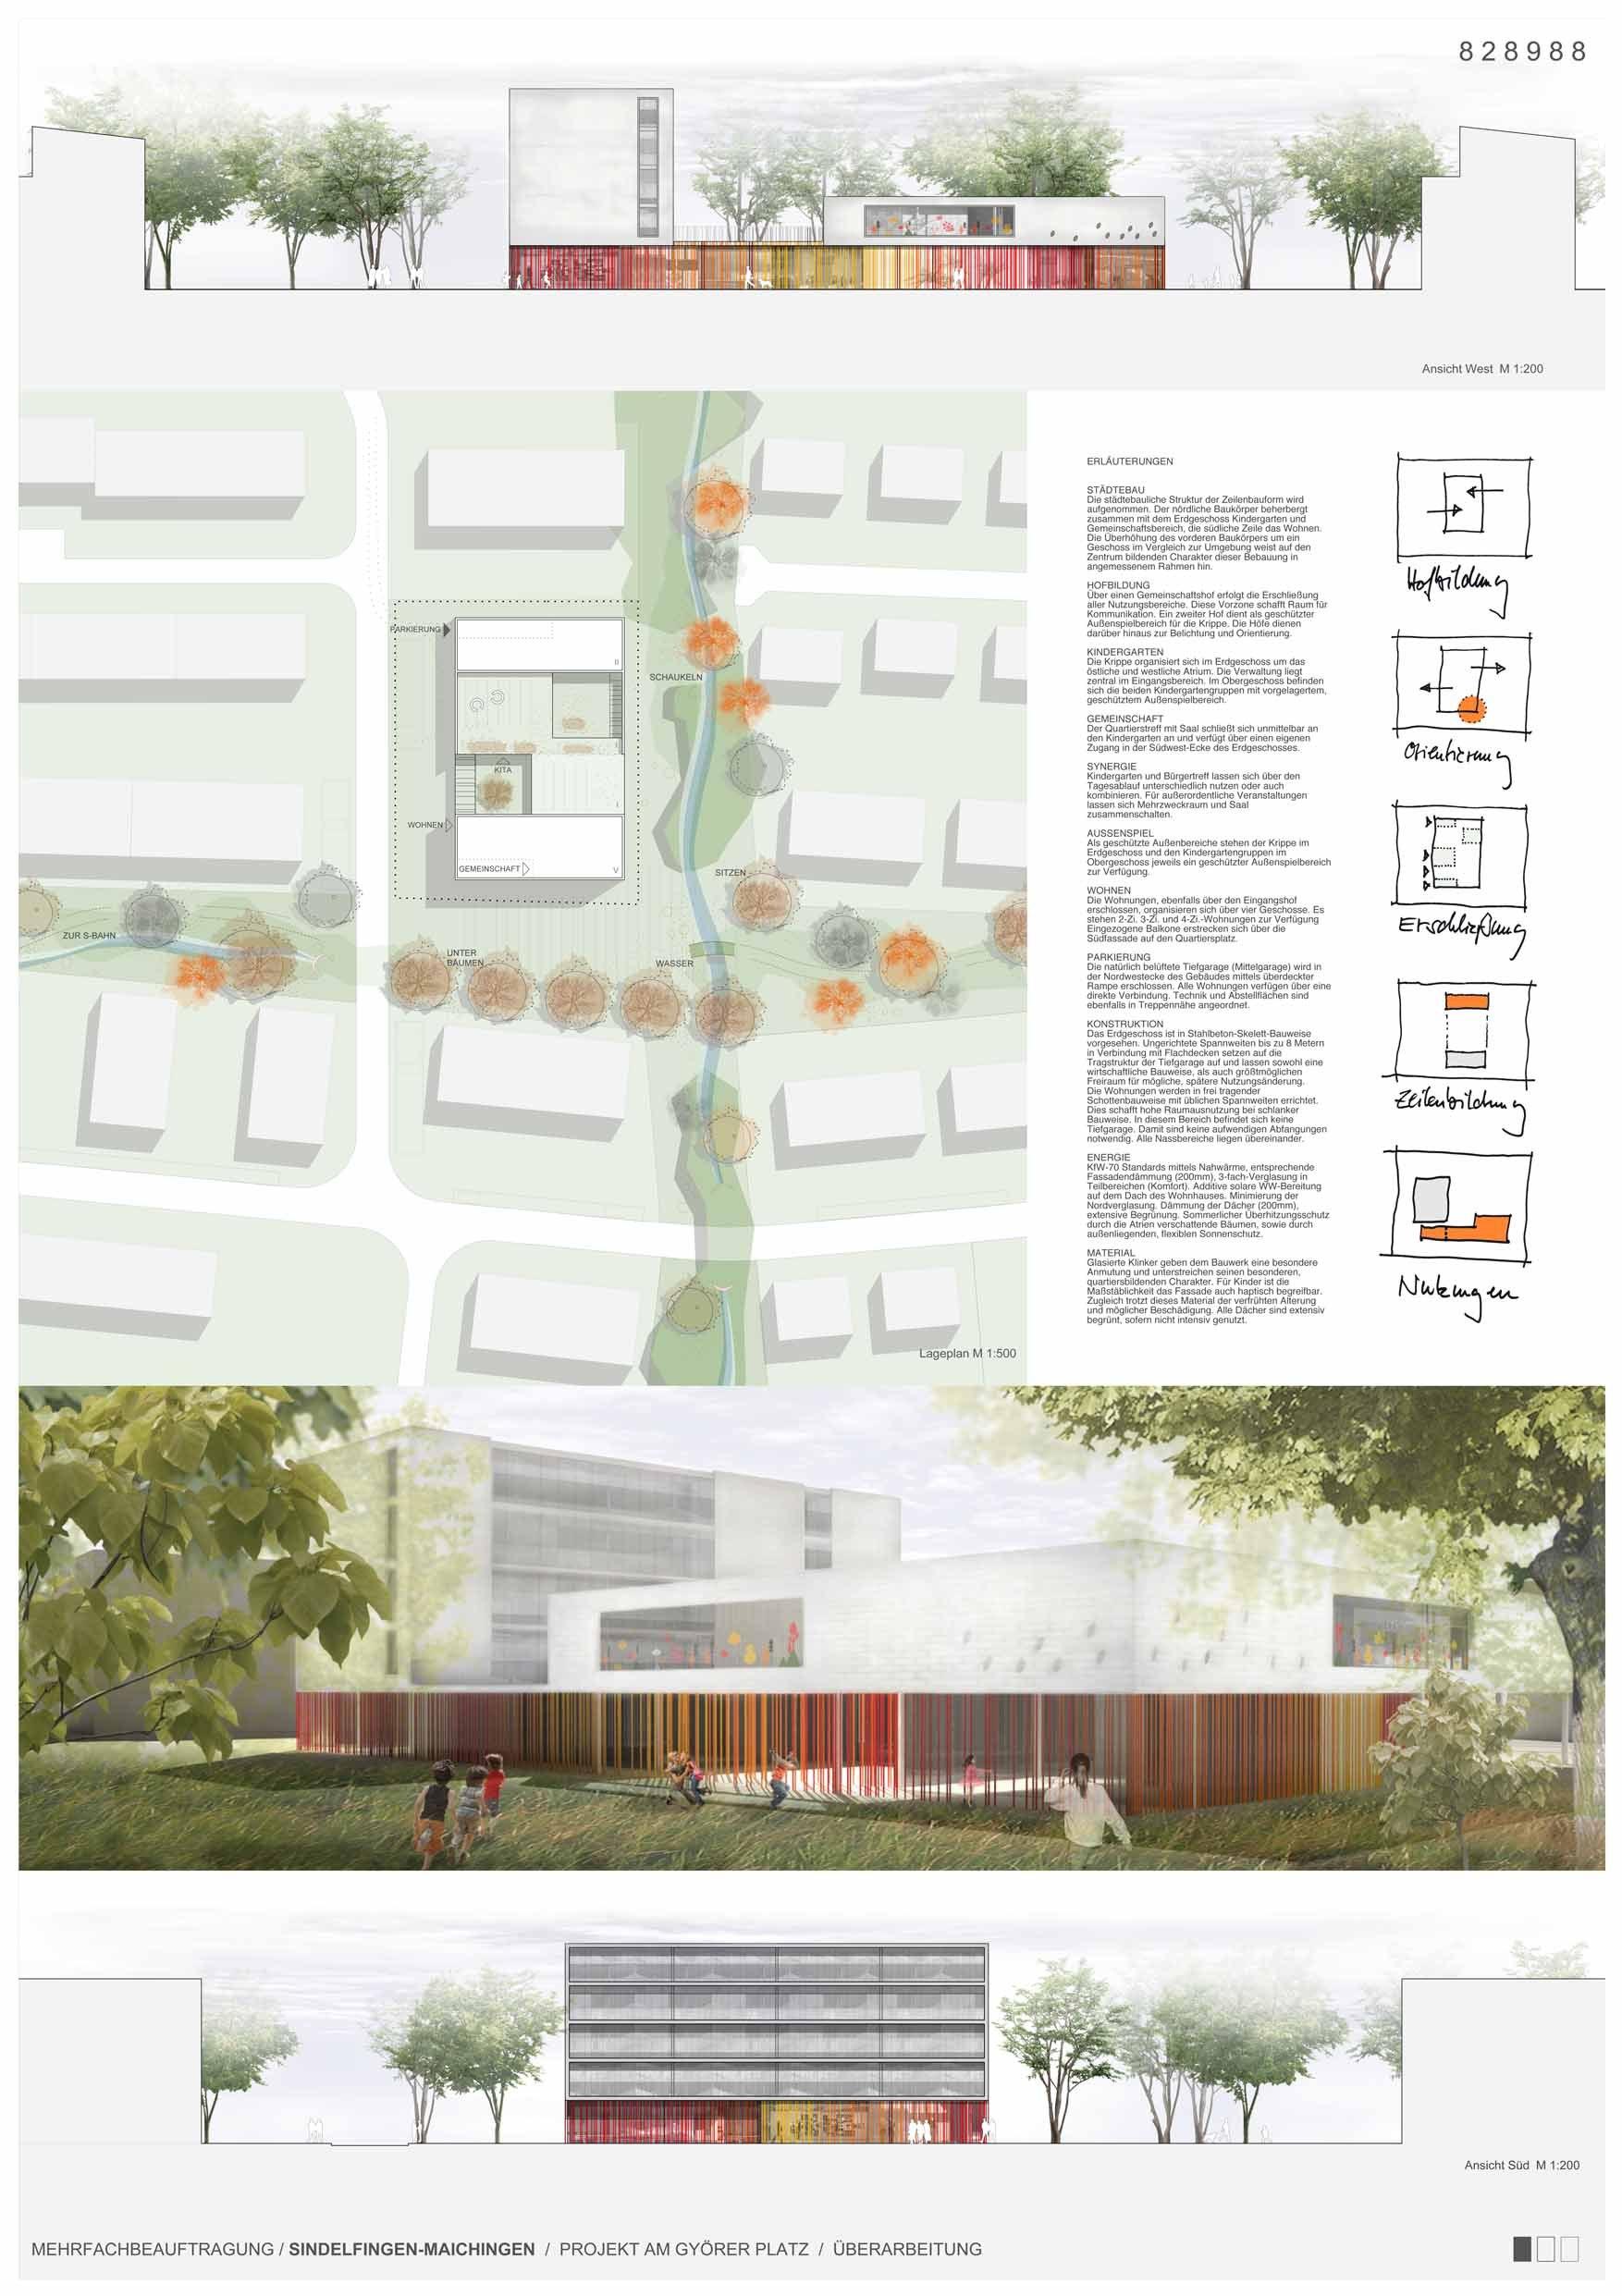 Gallery of Kindergarten, Housing and Community Hall